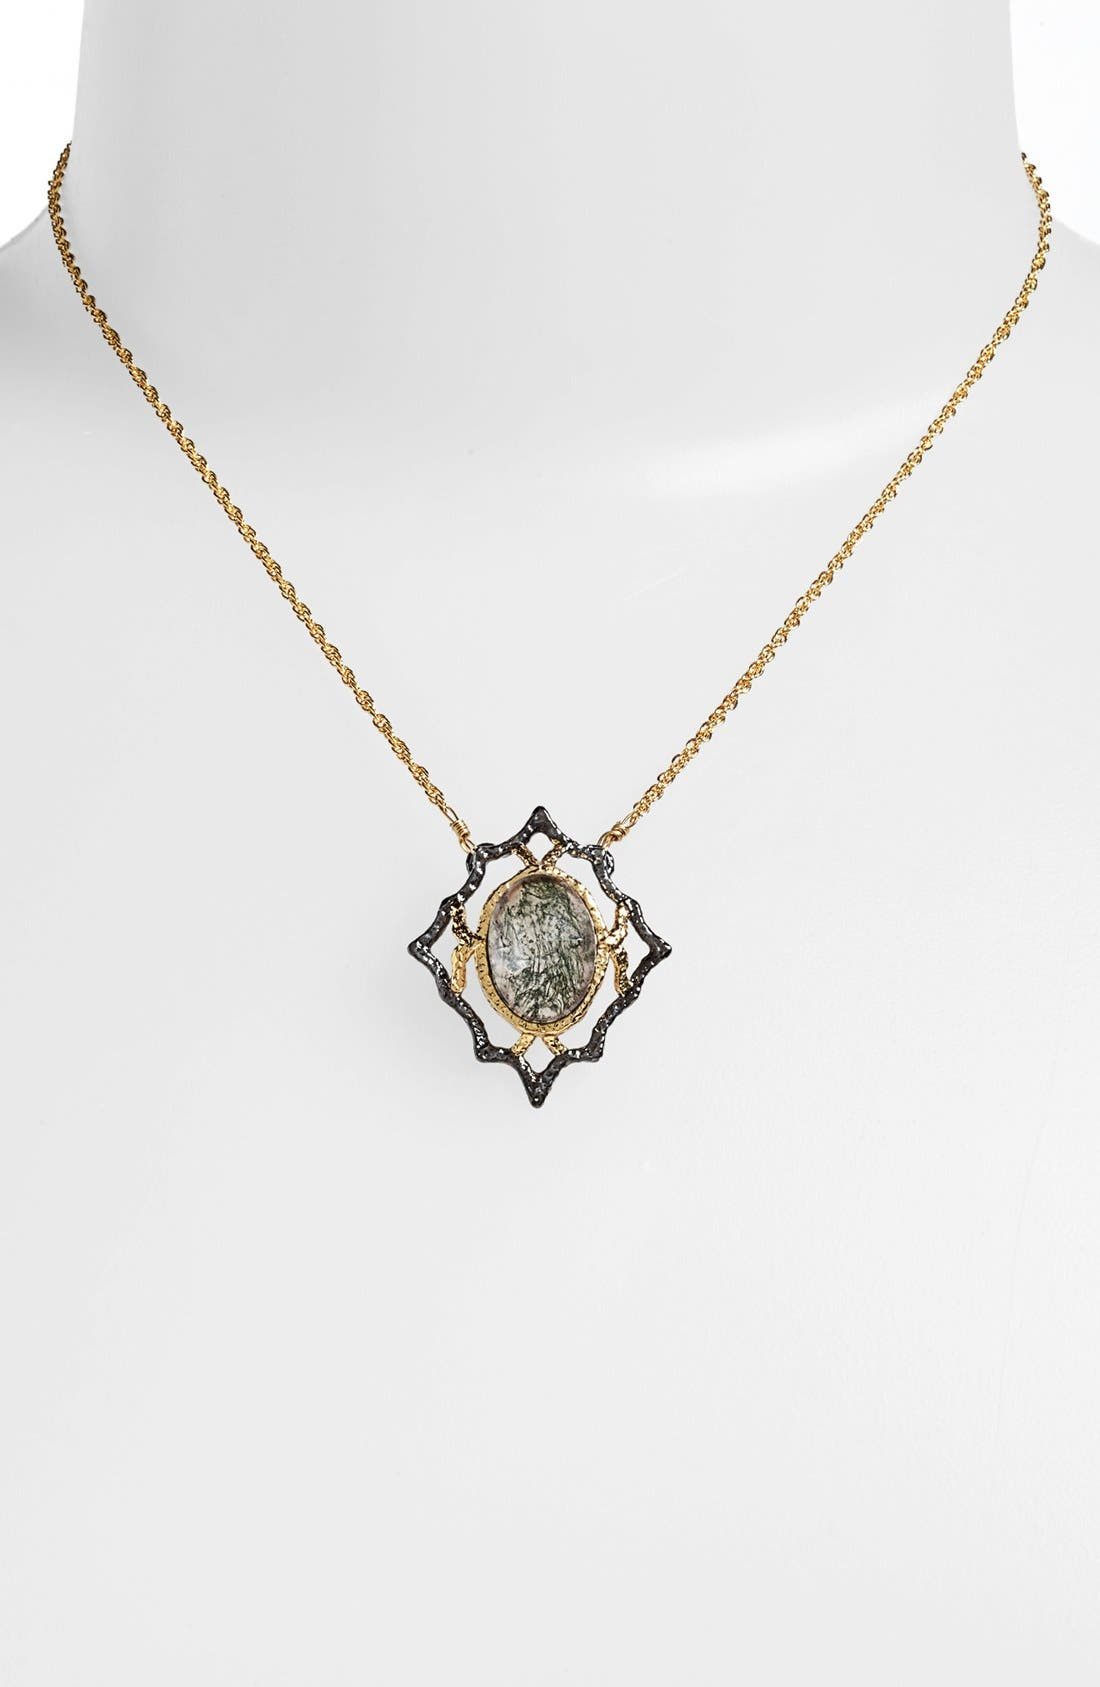 Alternate Image 1 Selected - Alexis Bittar 'Elements - Jardin de Papillon' Pendant Necklace